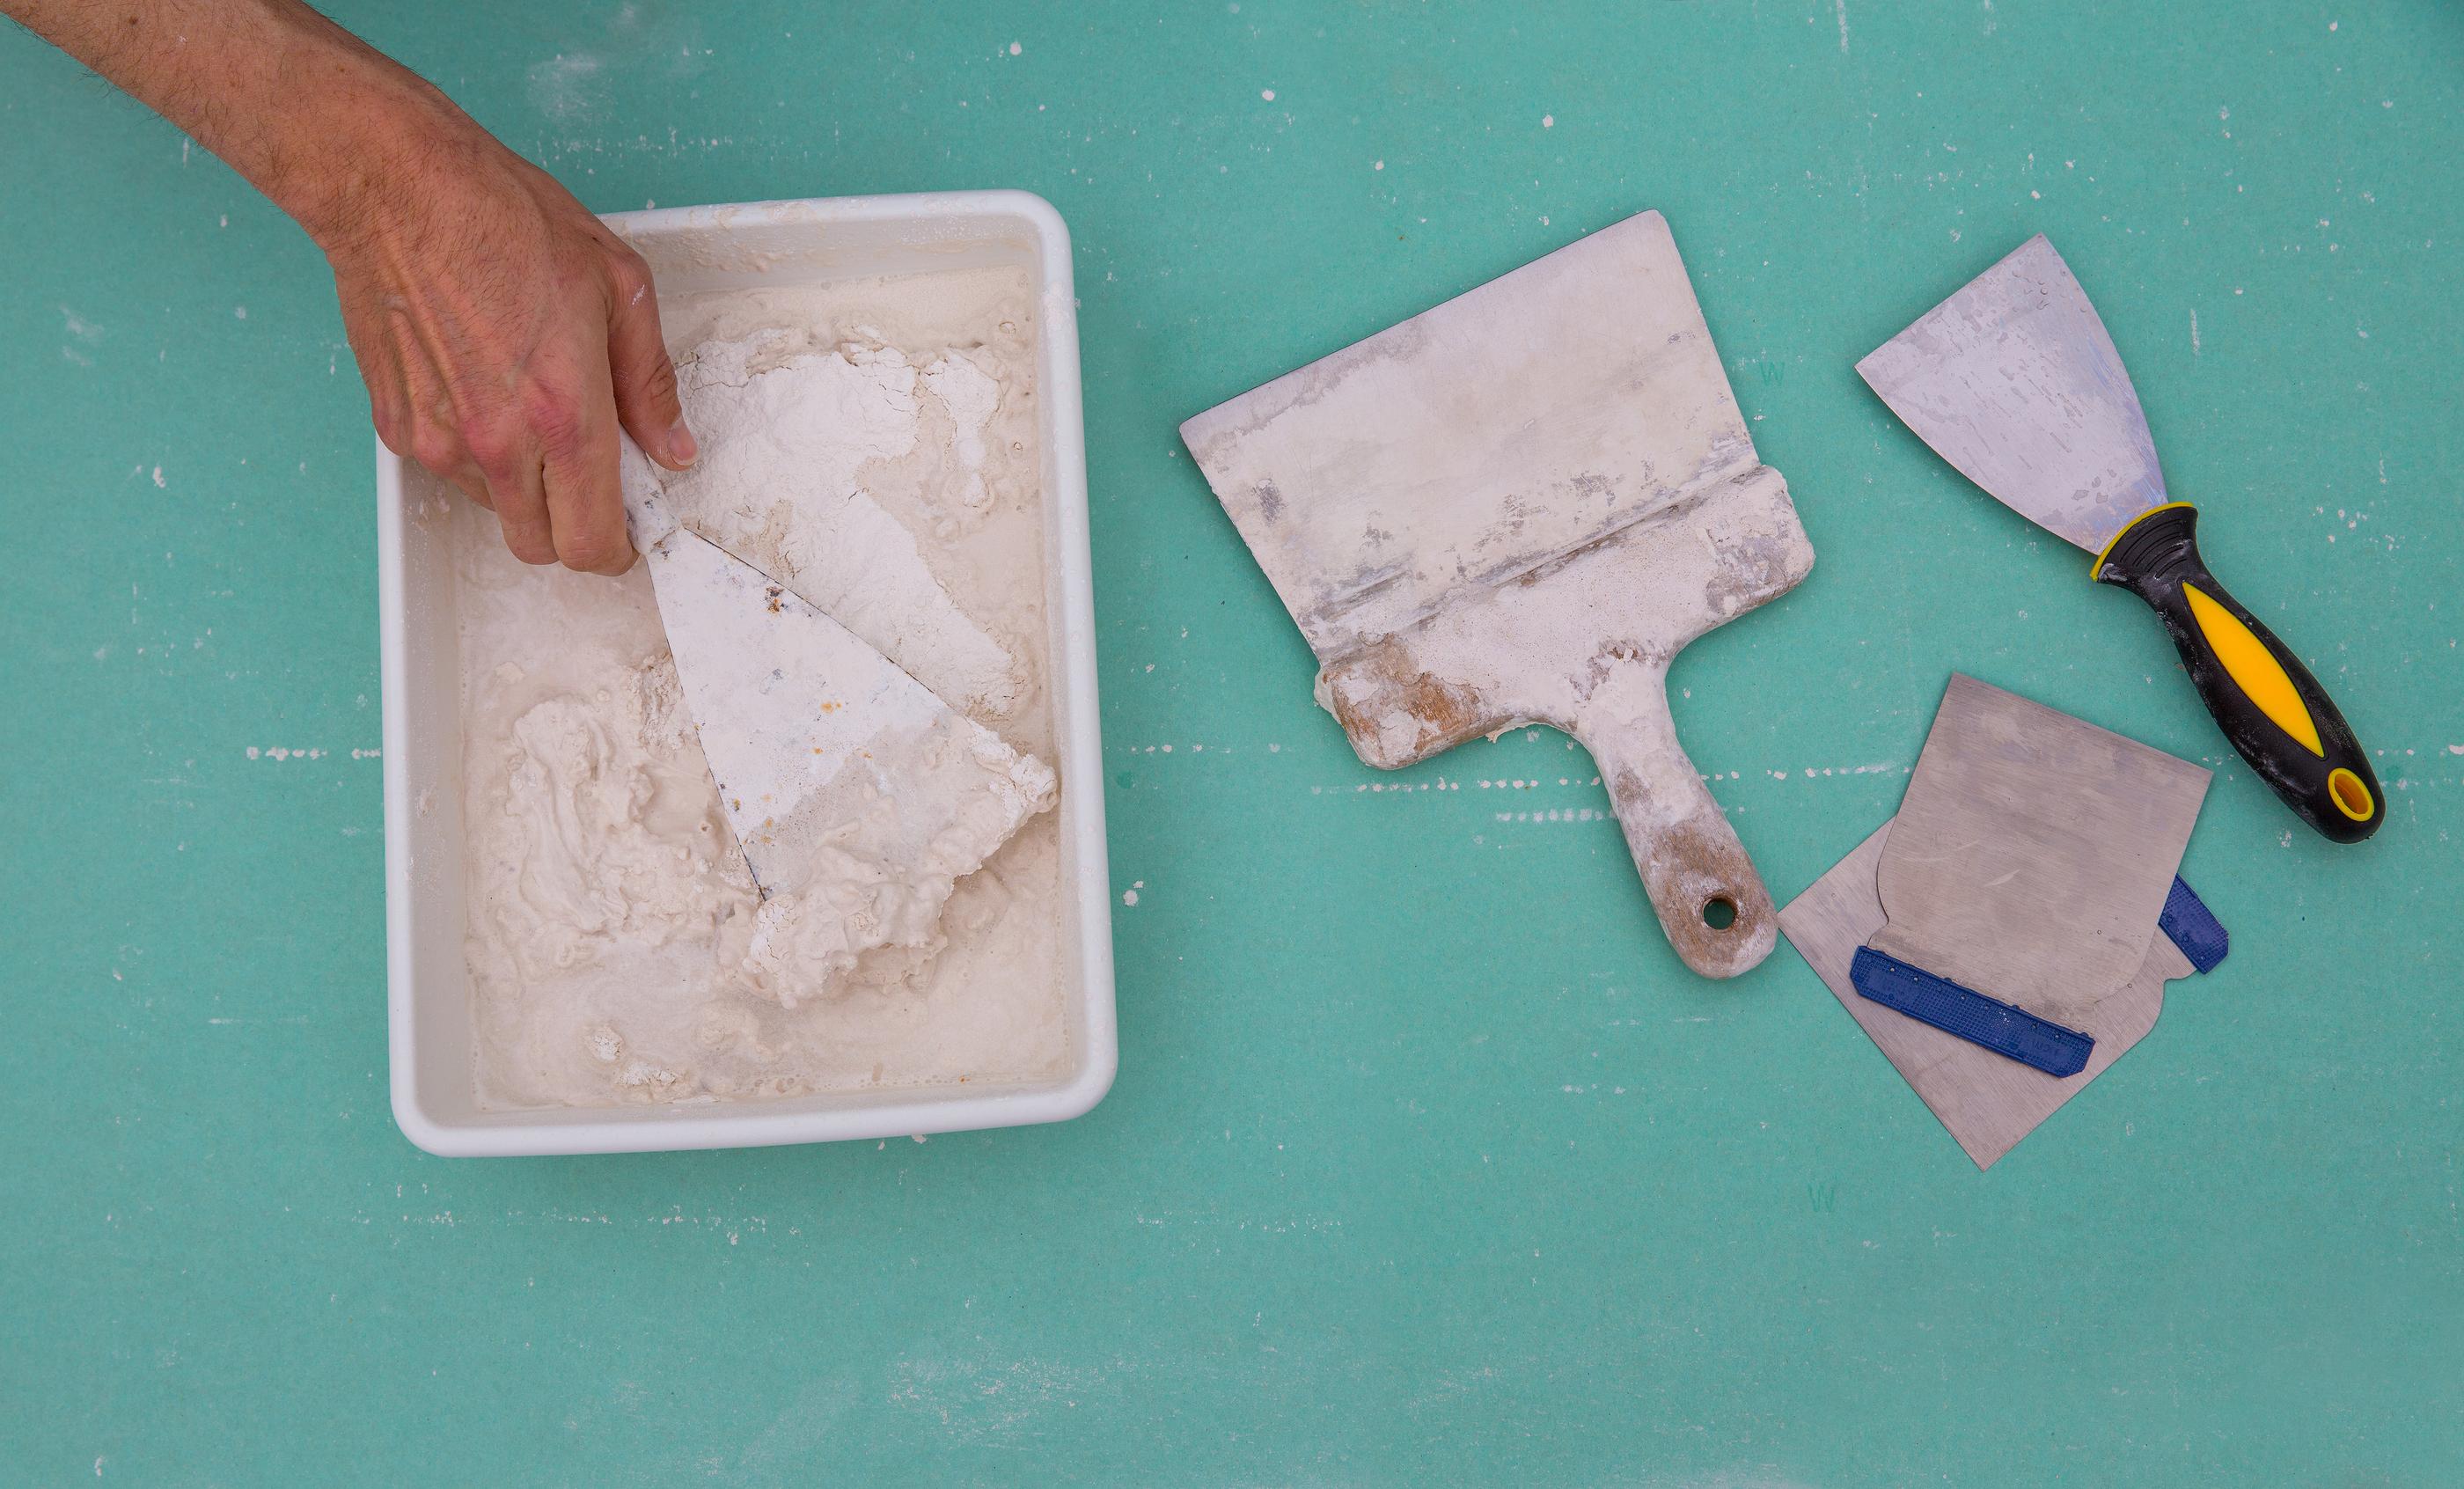 Plastering tools for plaster like plaste trowel spatula on green drywall plasterboard